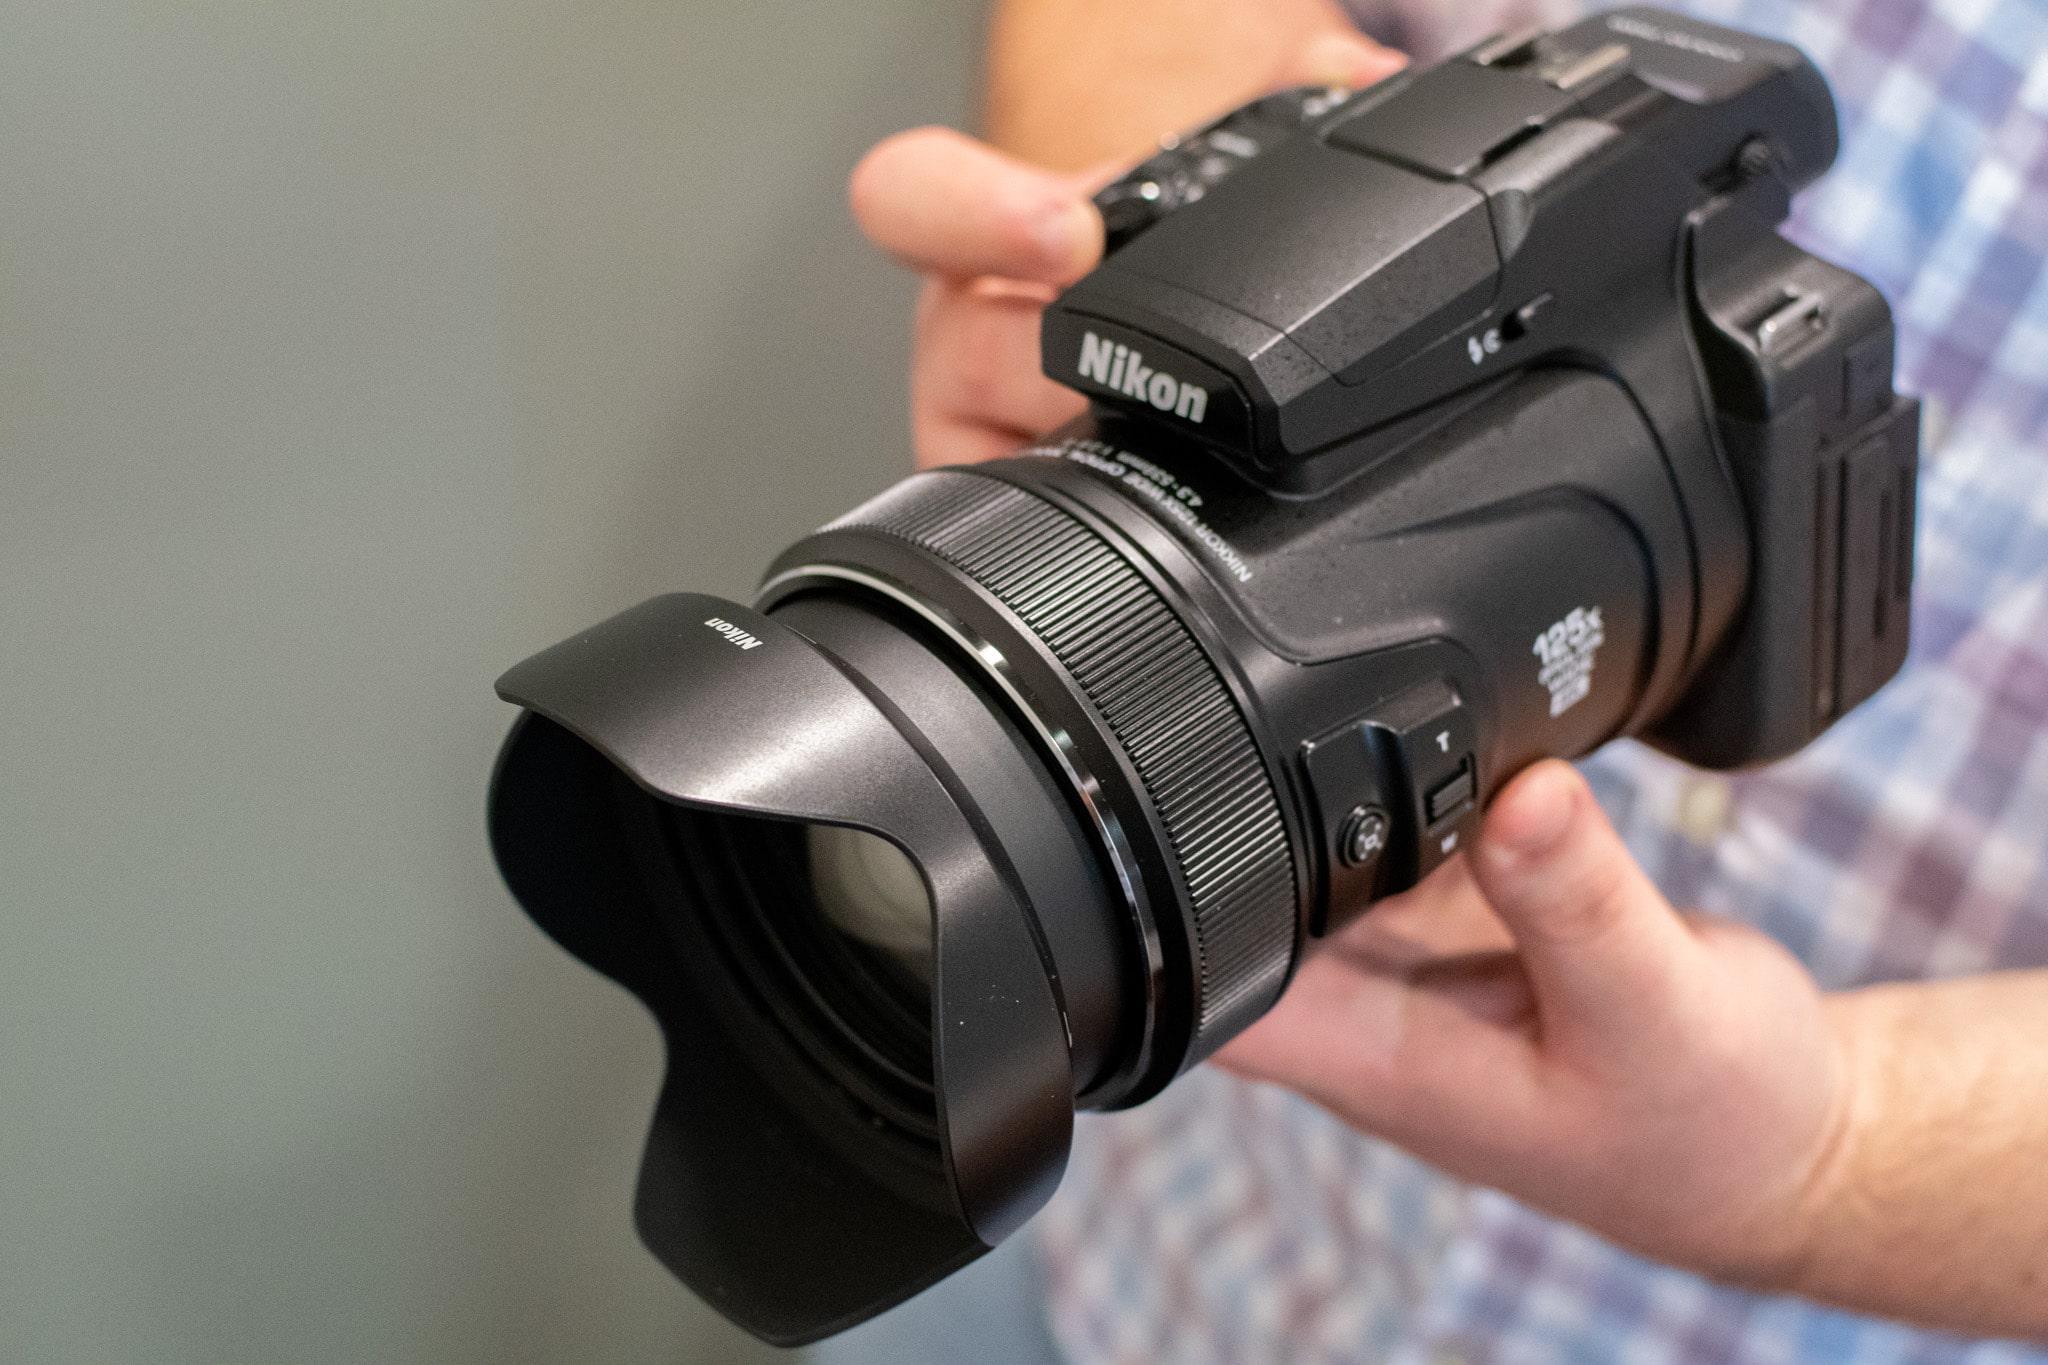 Nikon Coolpix P1000 firmware 1.3